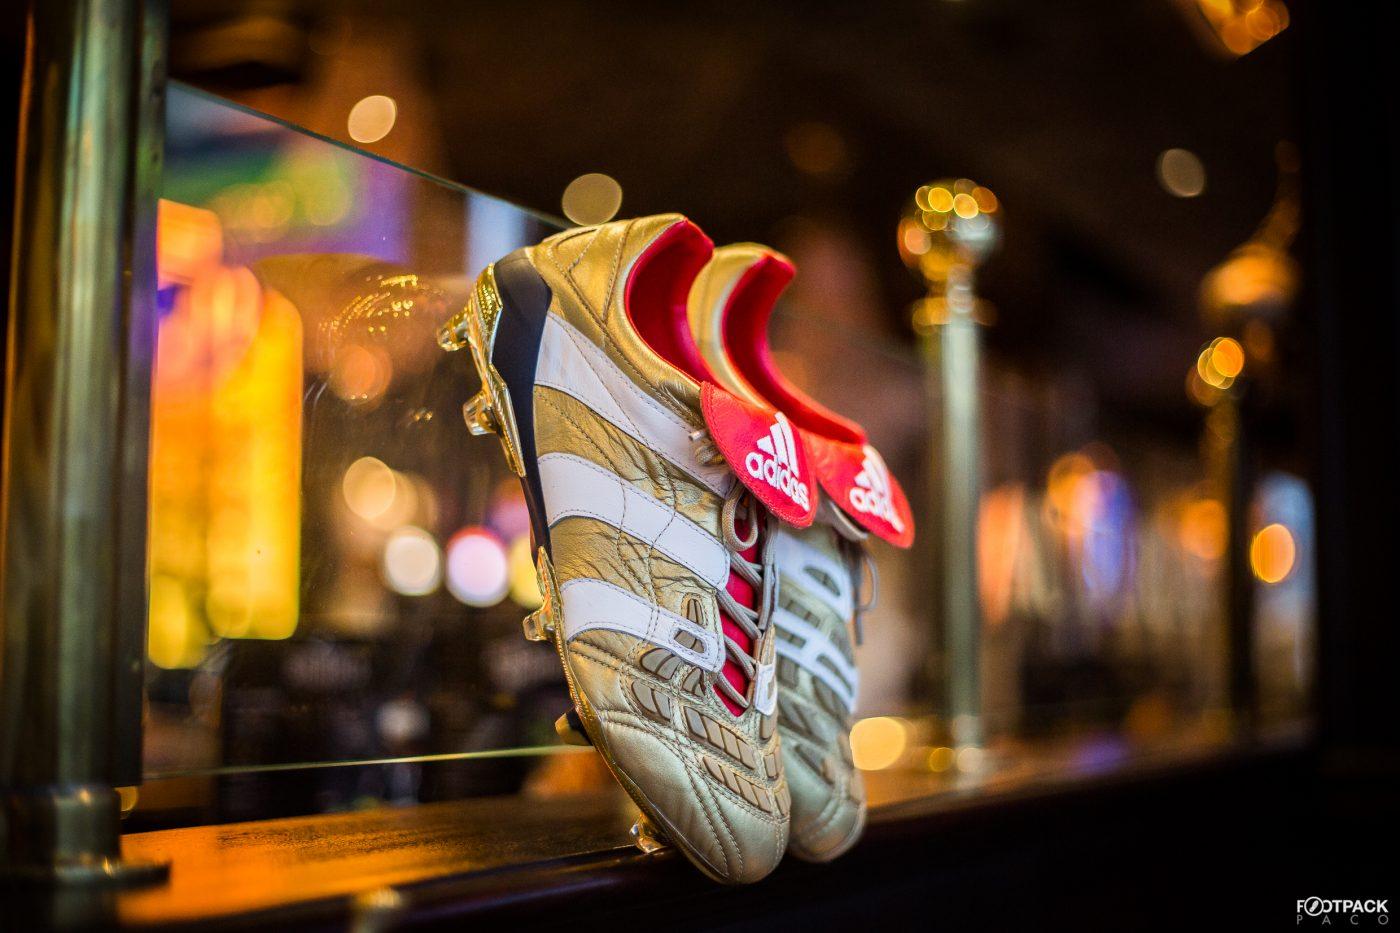 adidas-predator-accelerator-zinedine-zidane-collection-limitee-25-ans-predator-footpack-17